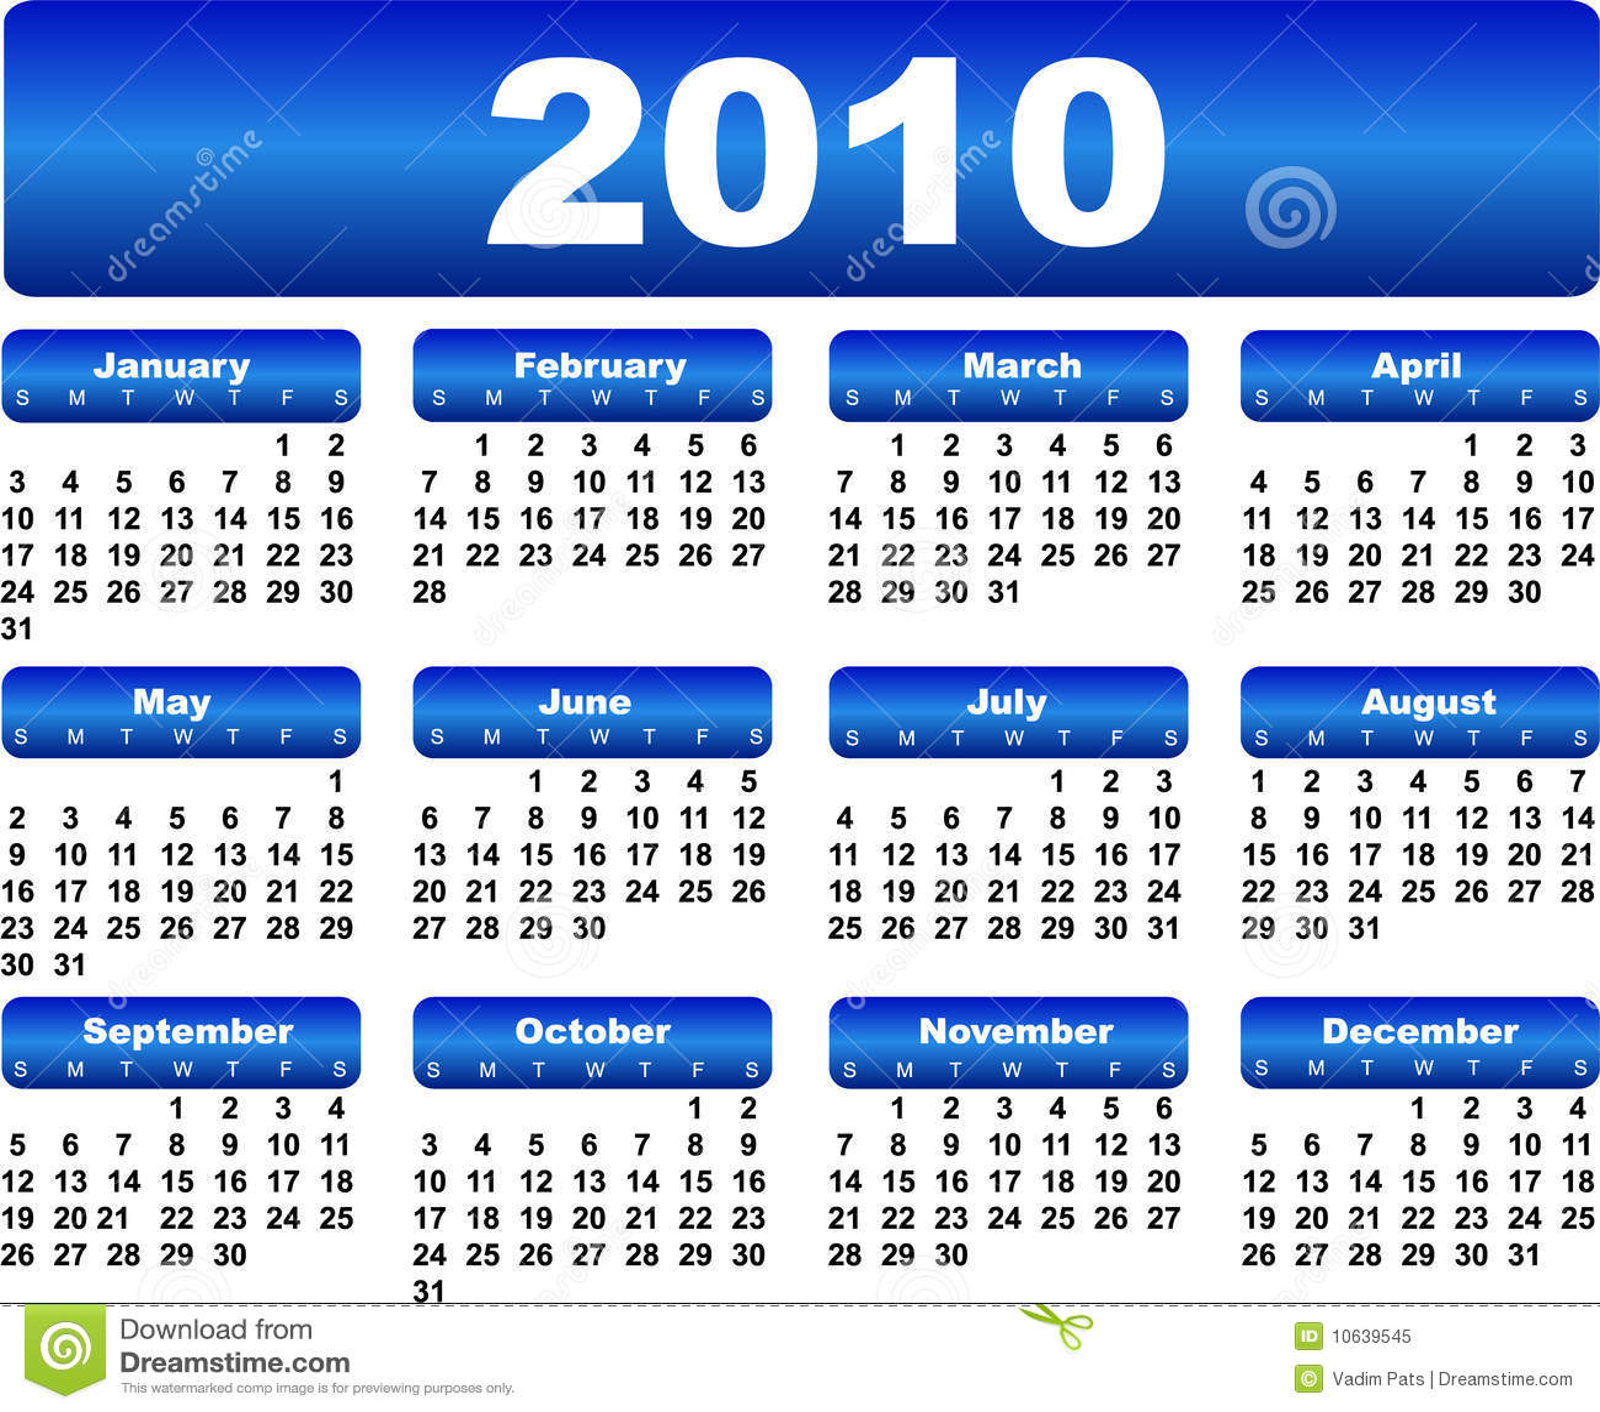 Calendar For 2010 Roya... August Calendar Clipart